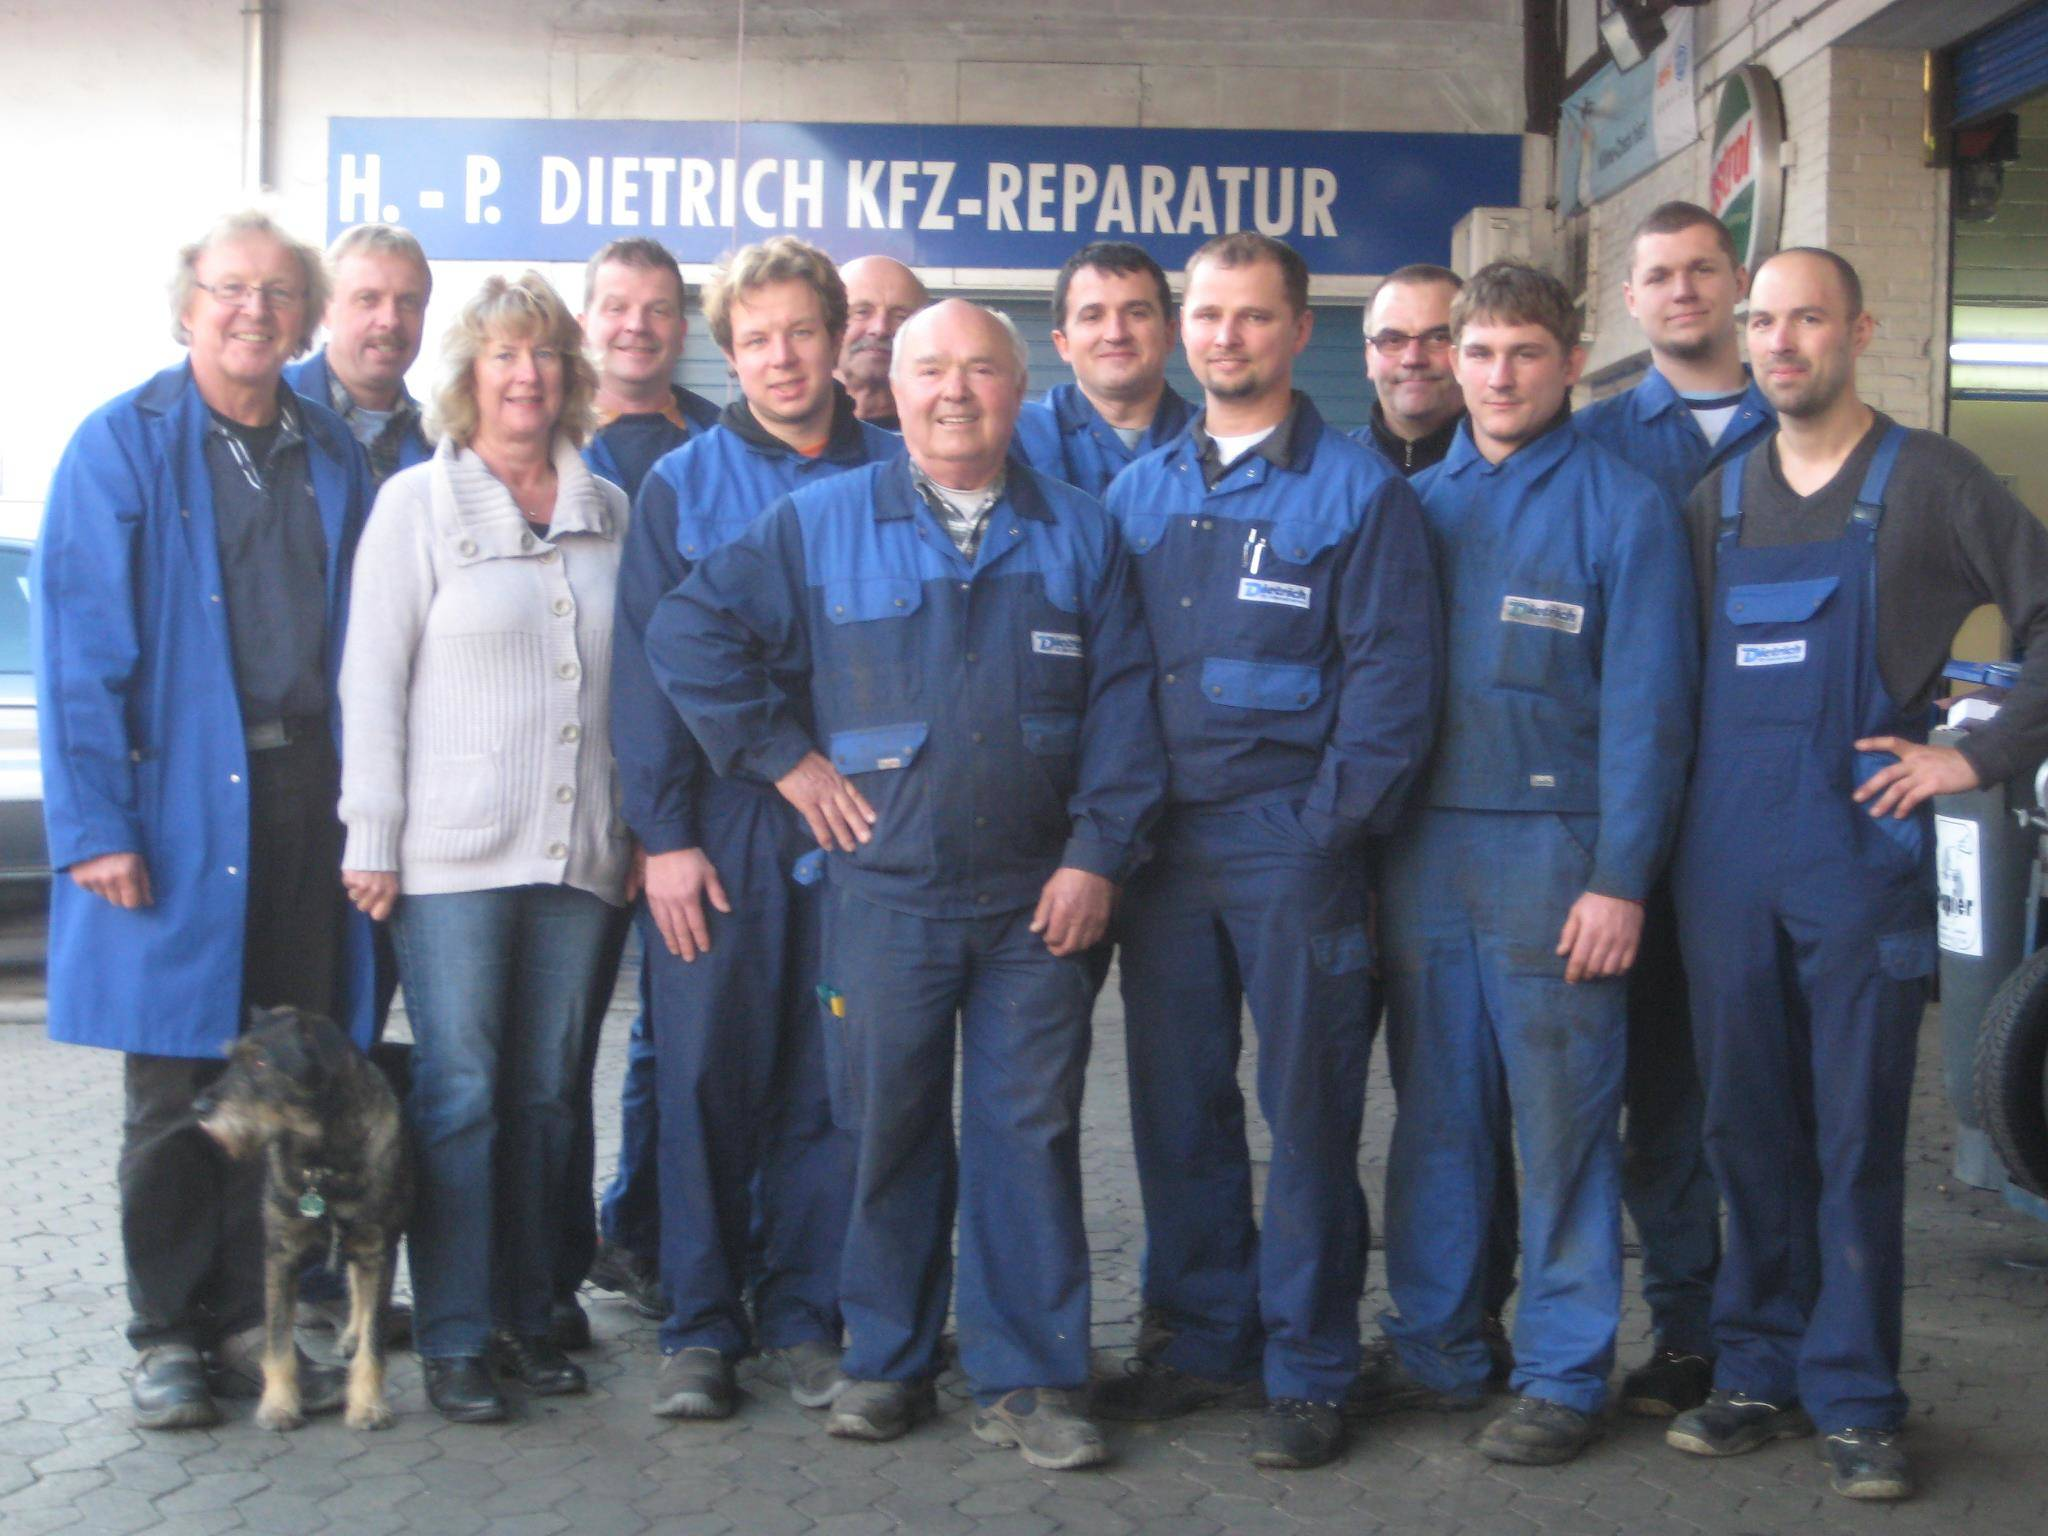 Team Kfz Dietrich